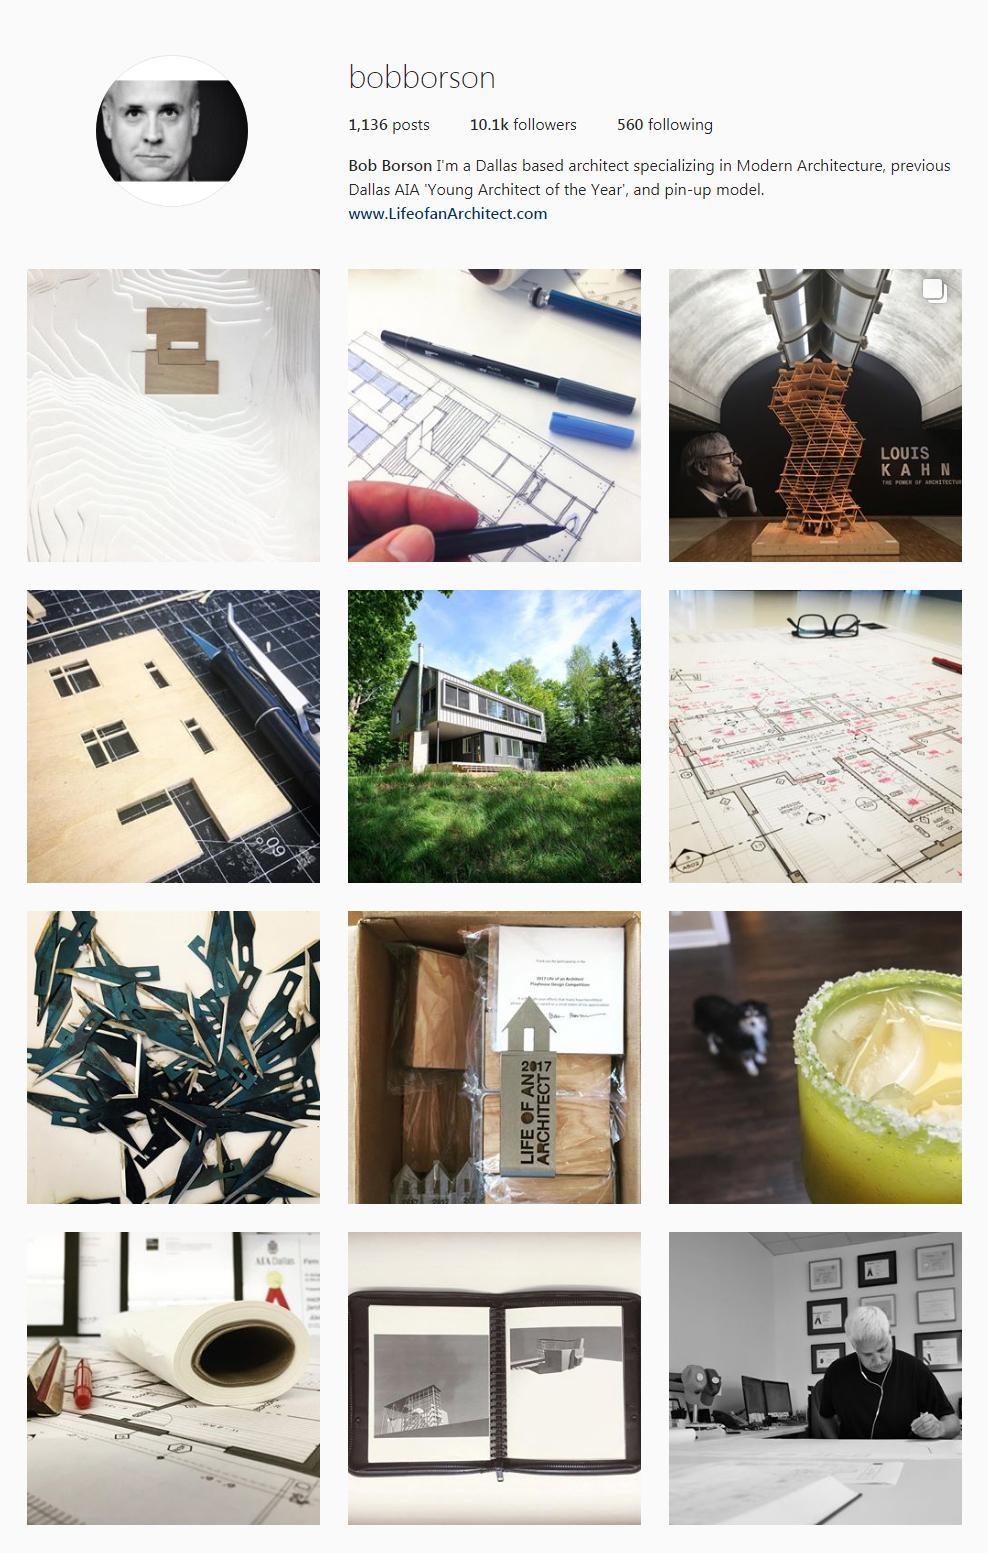 Best Architectural Instagram Feeds of 2017